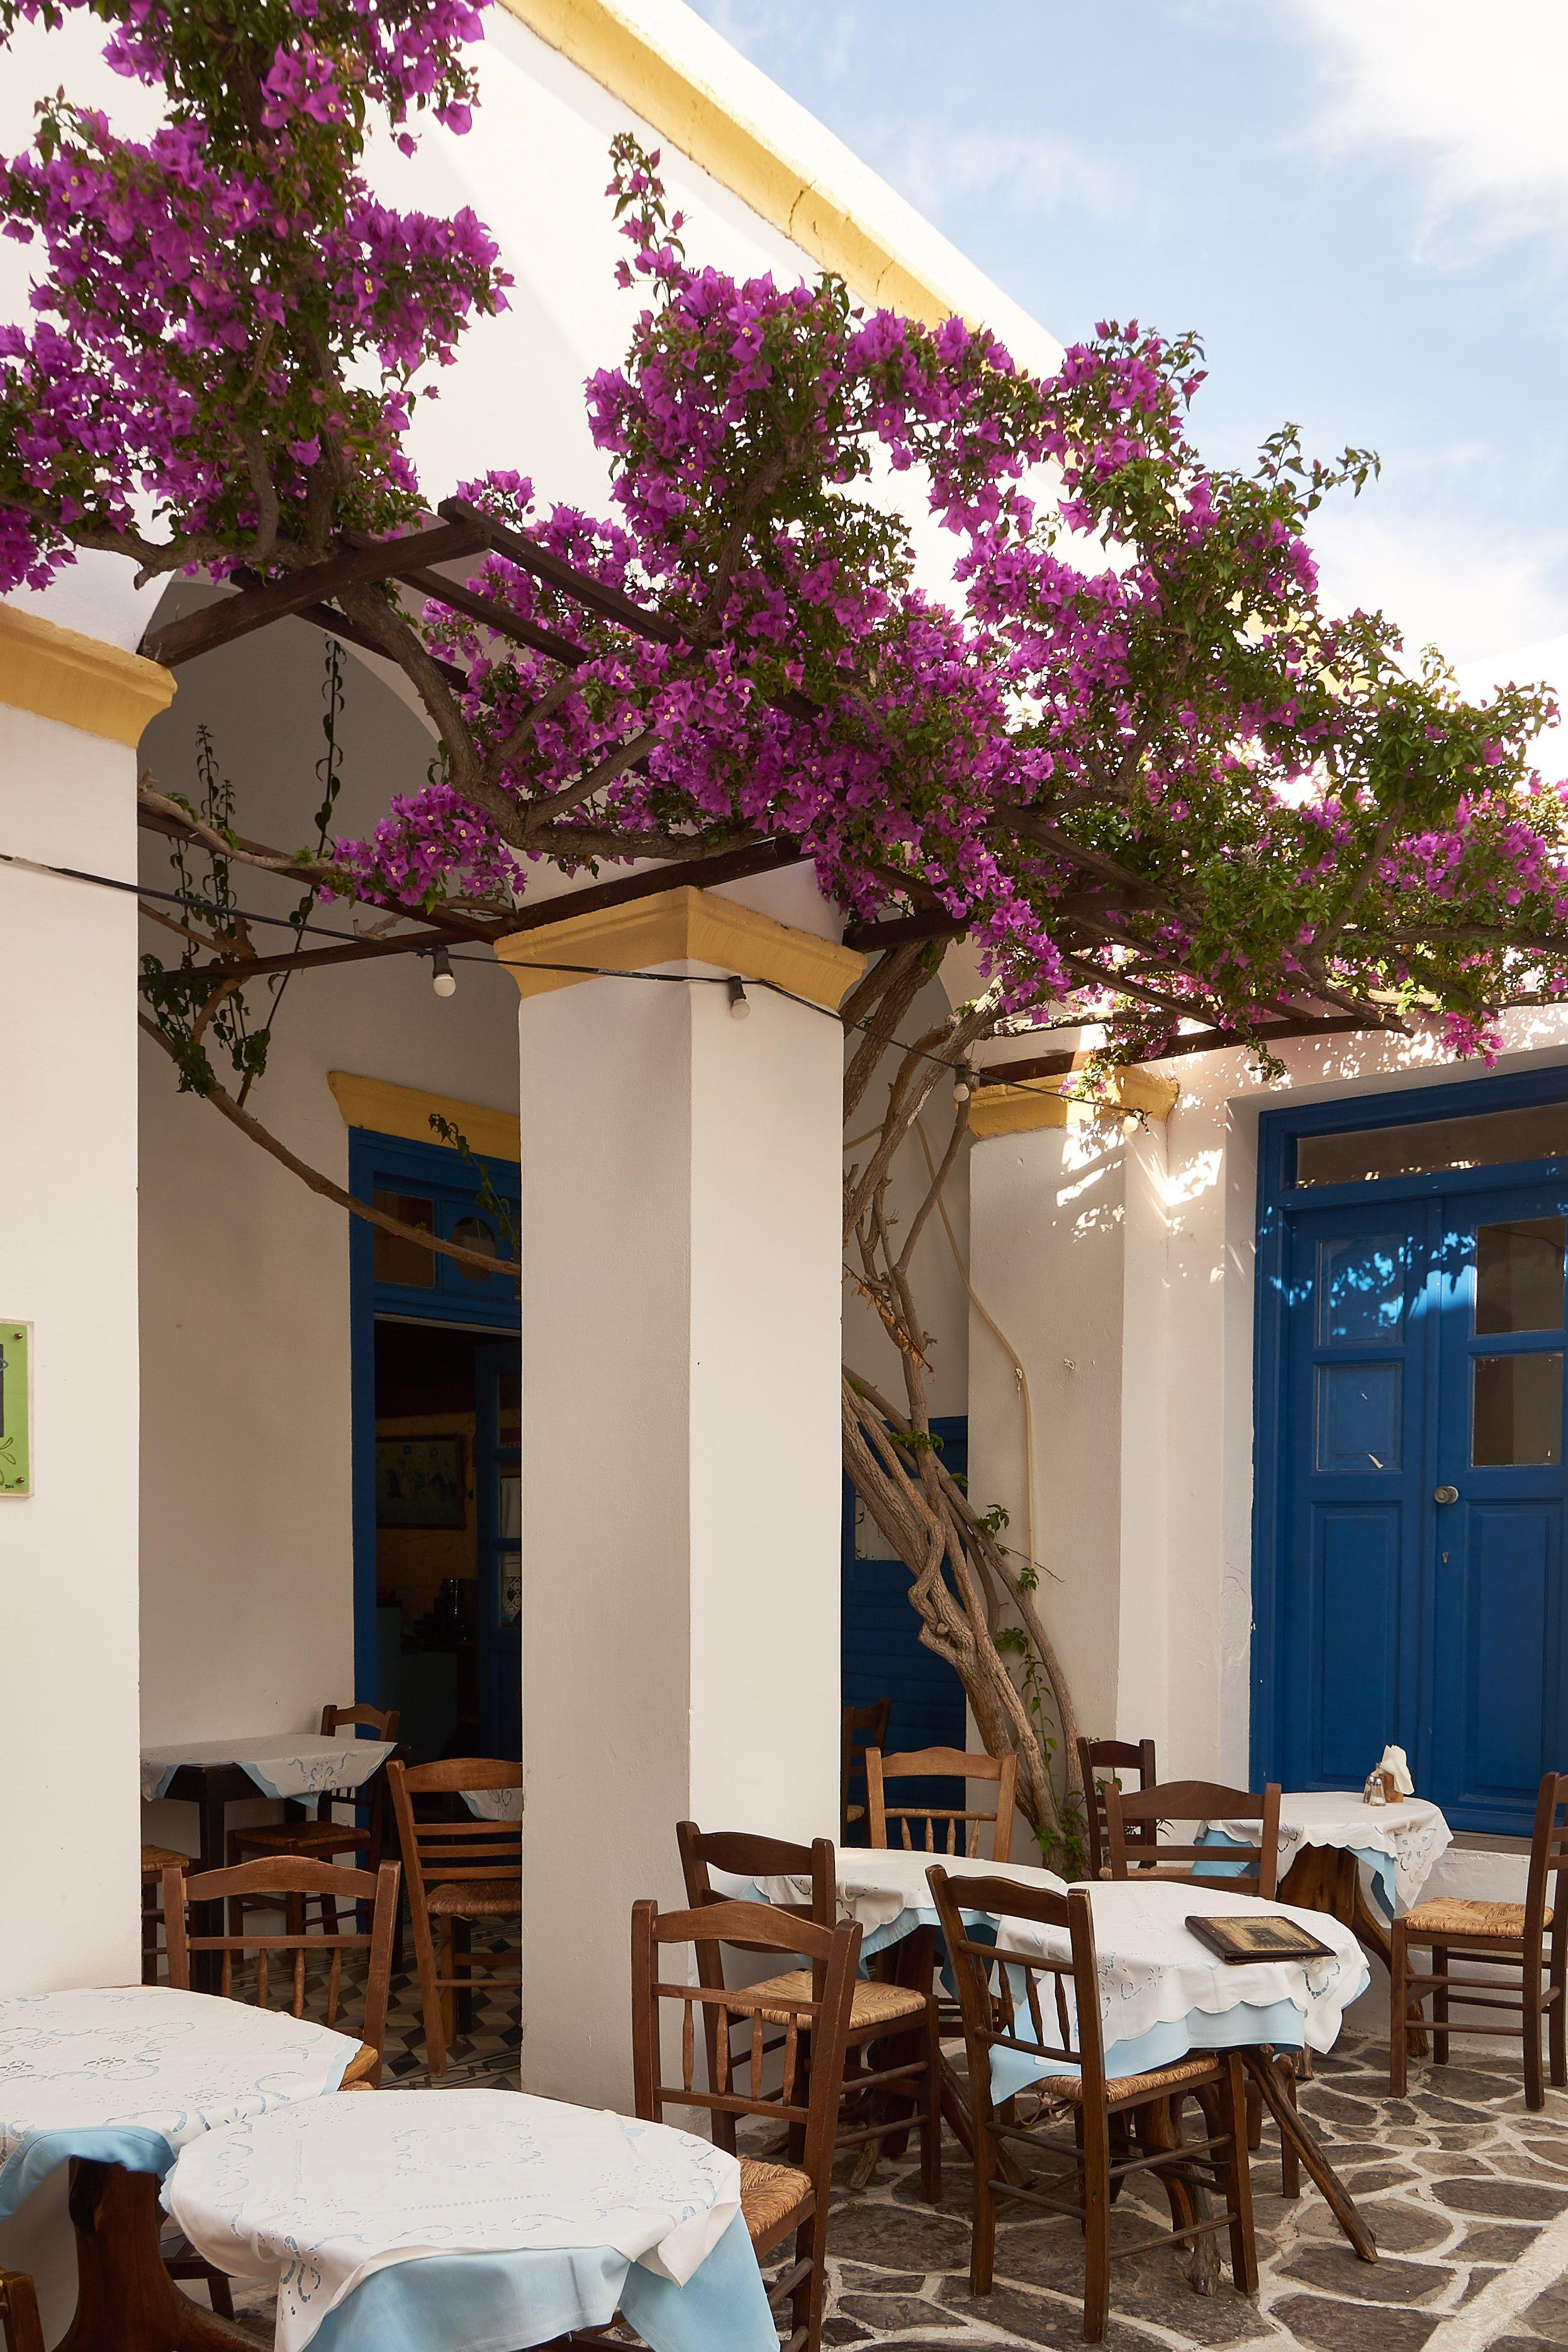 Taverne Archontoula